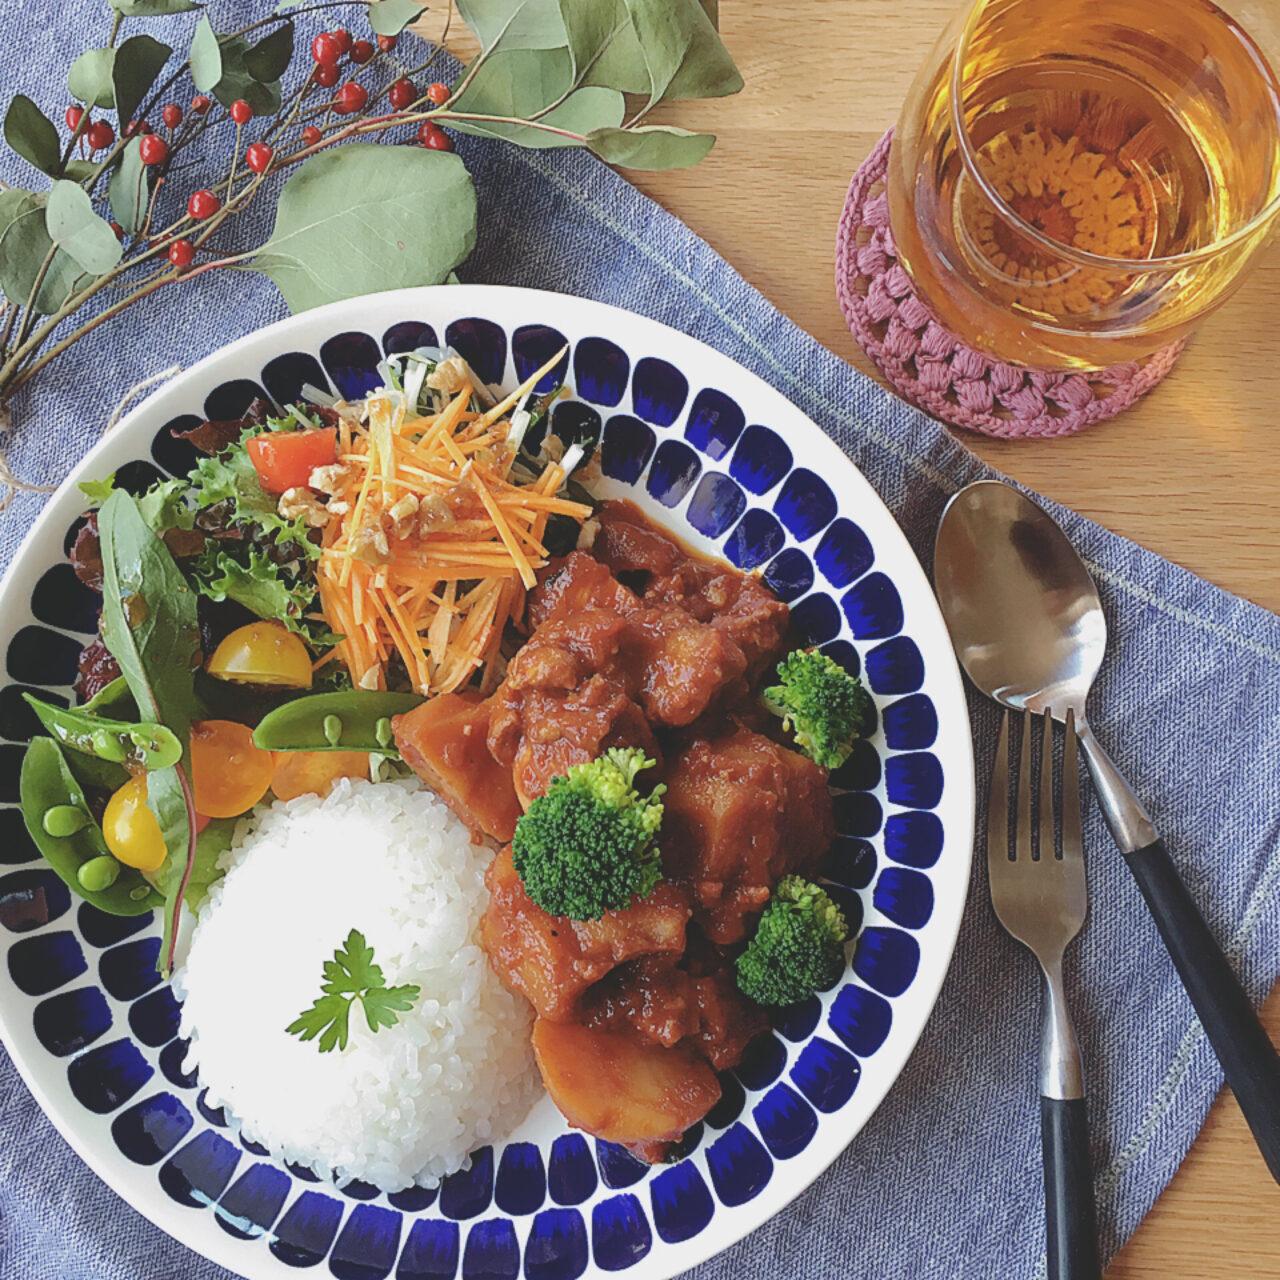 To:一人暮らしさん/主婦さん。余りがちな食材で作る14のレシピをご提案